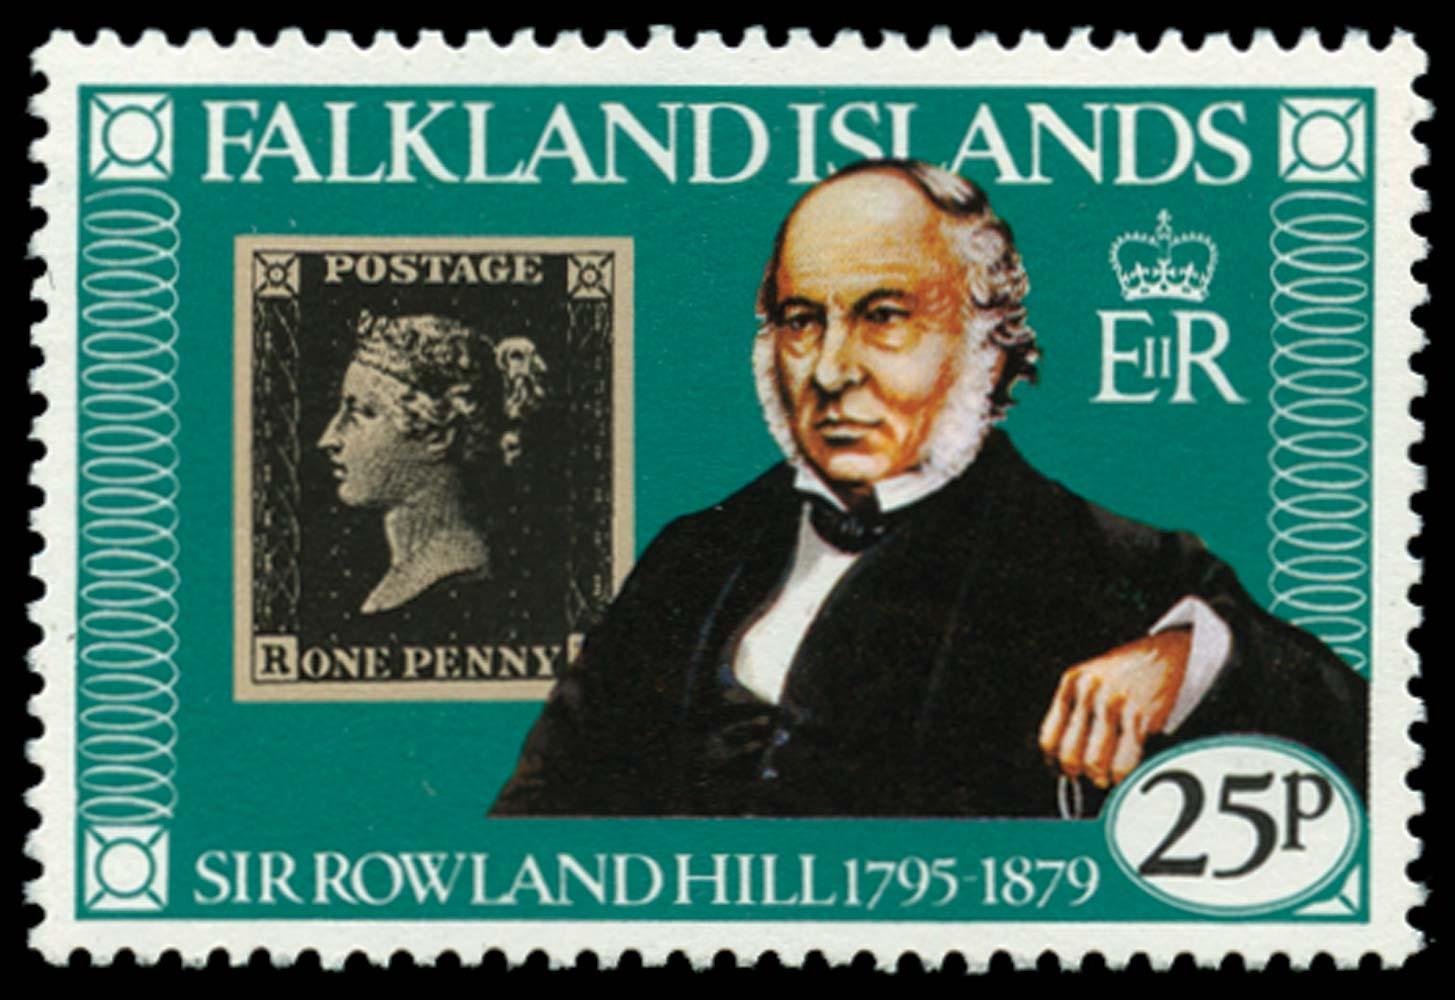 FALKLAND ISLANDS 1979  SG366w Mint